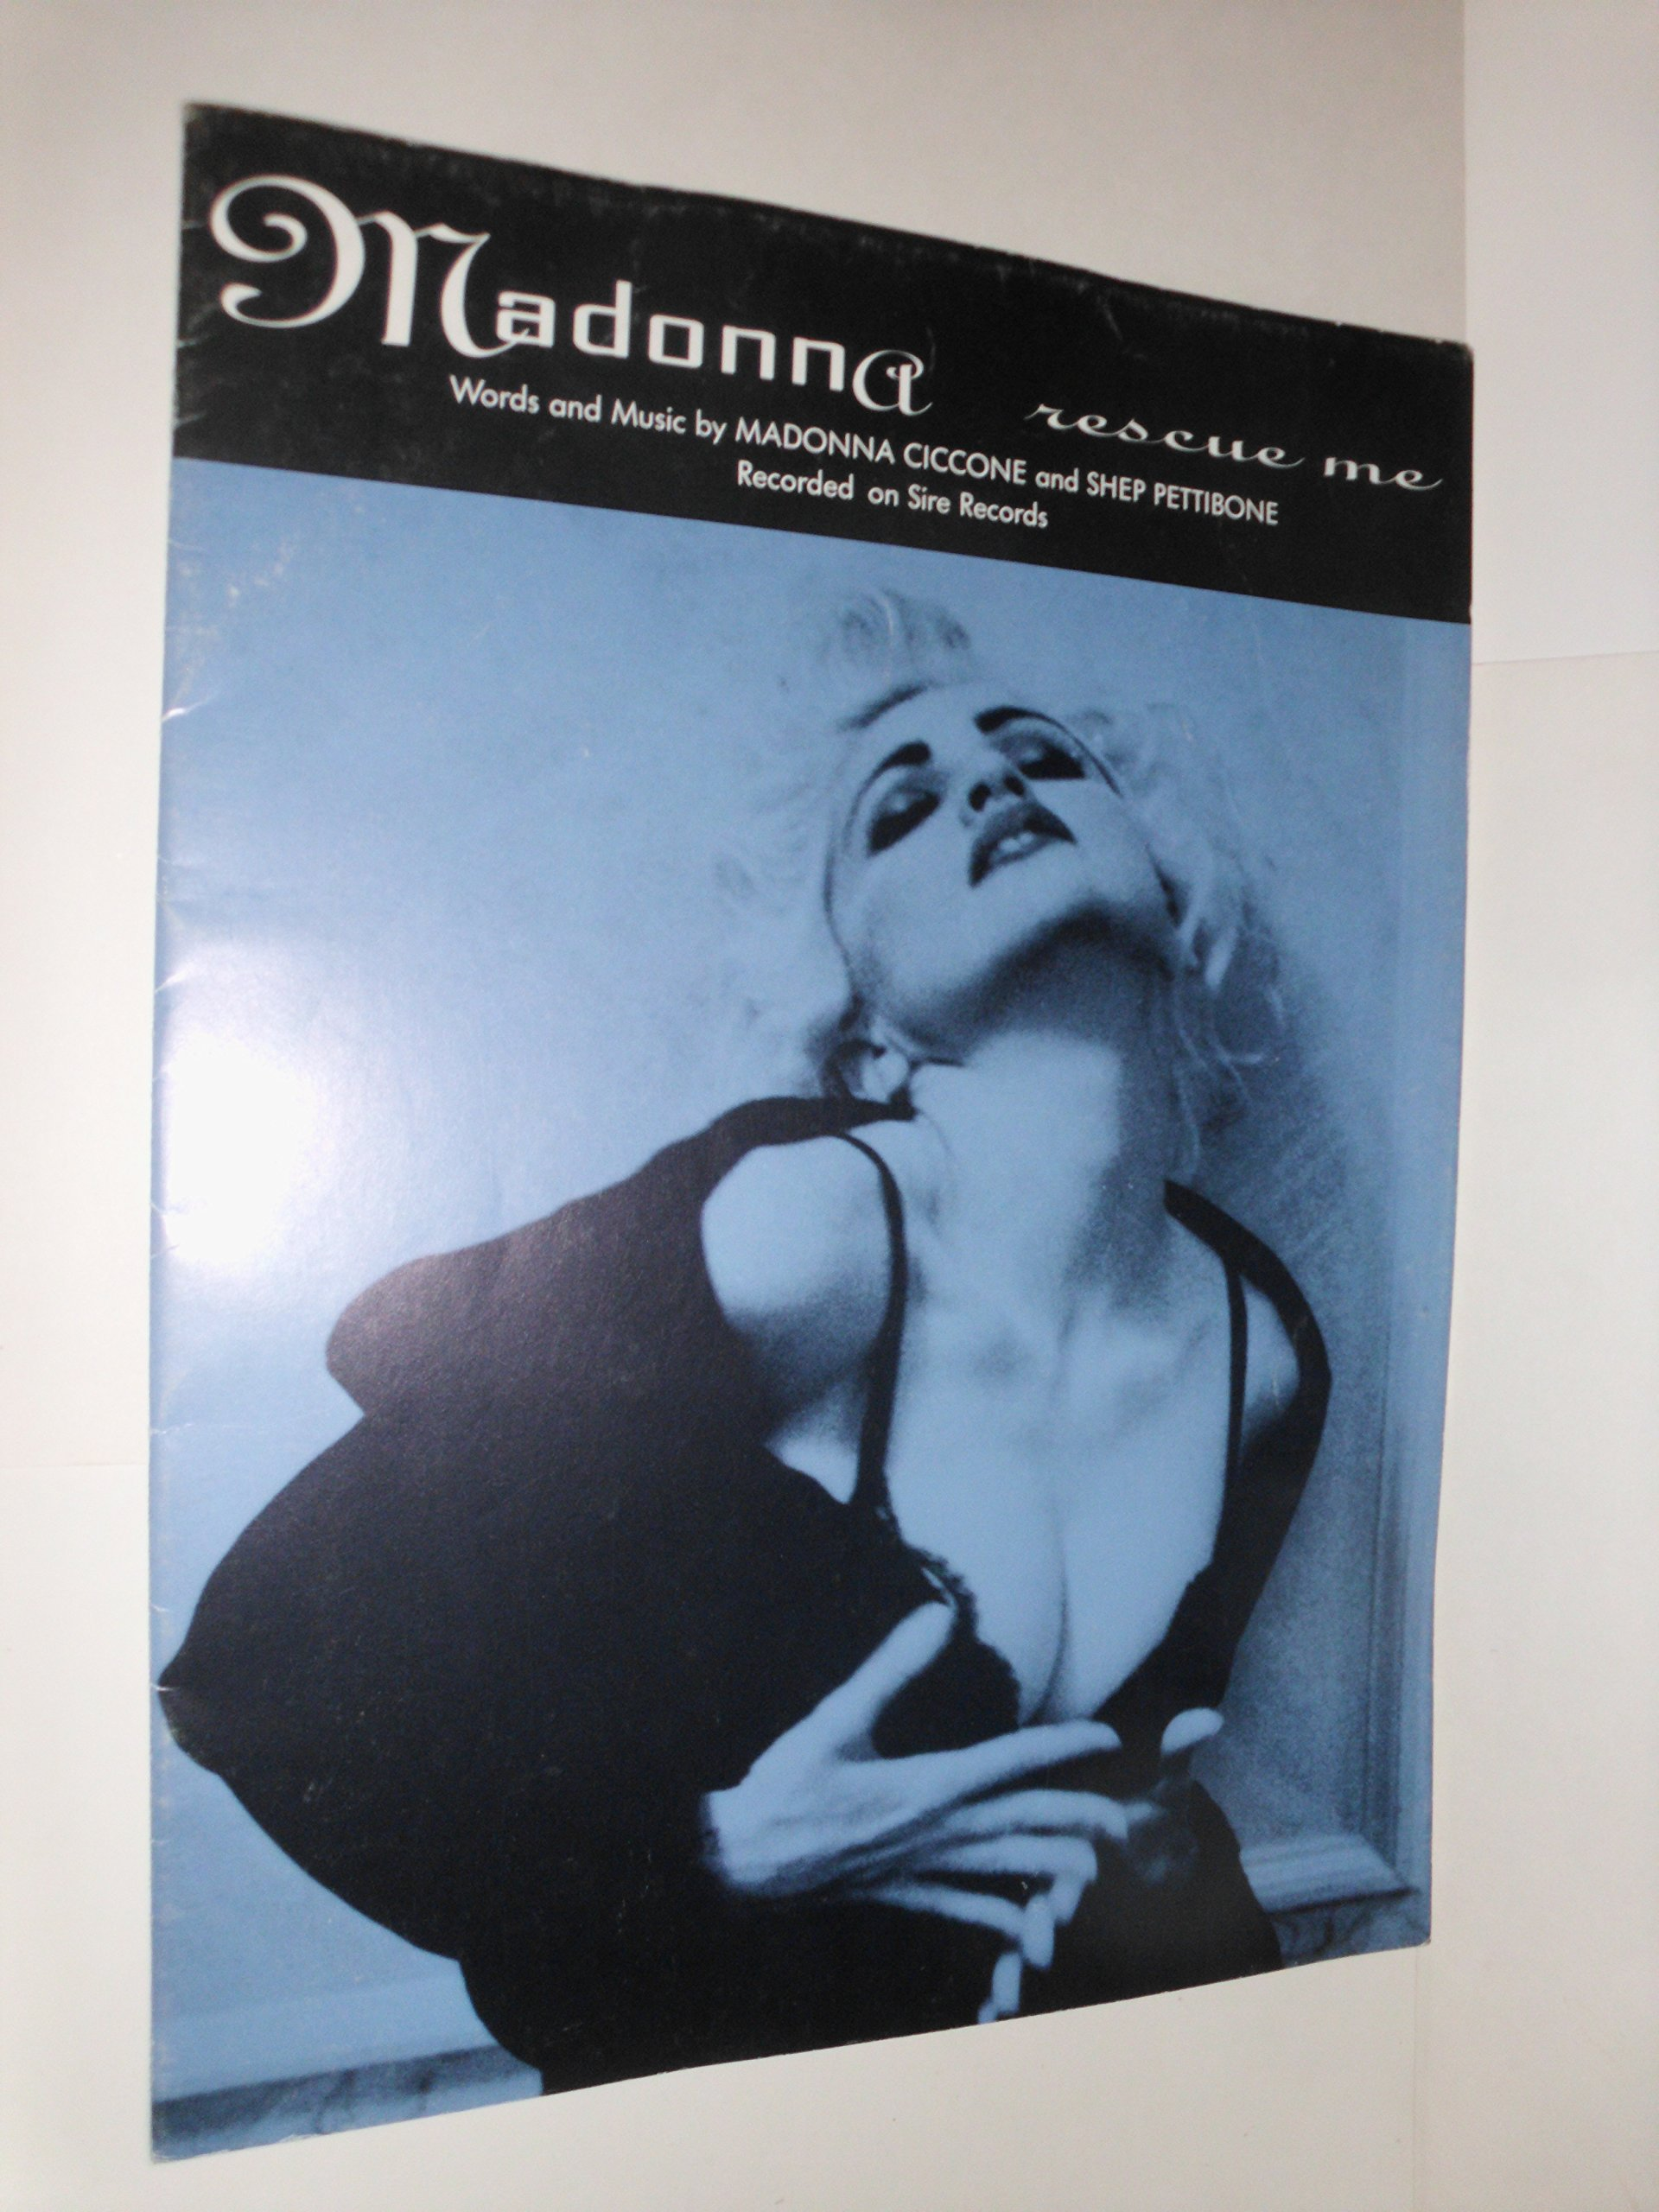 rescue me madonna 1990 piano vocal sheet music